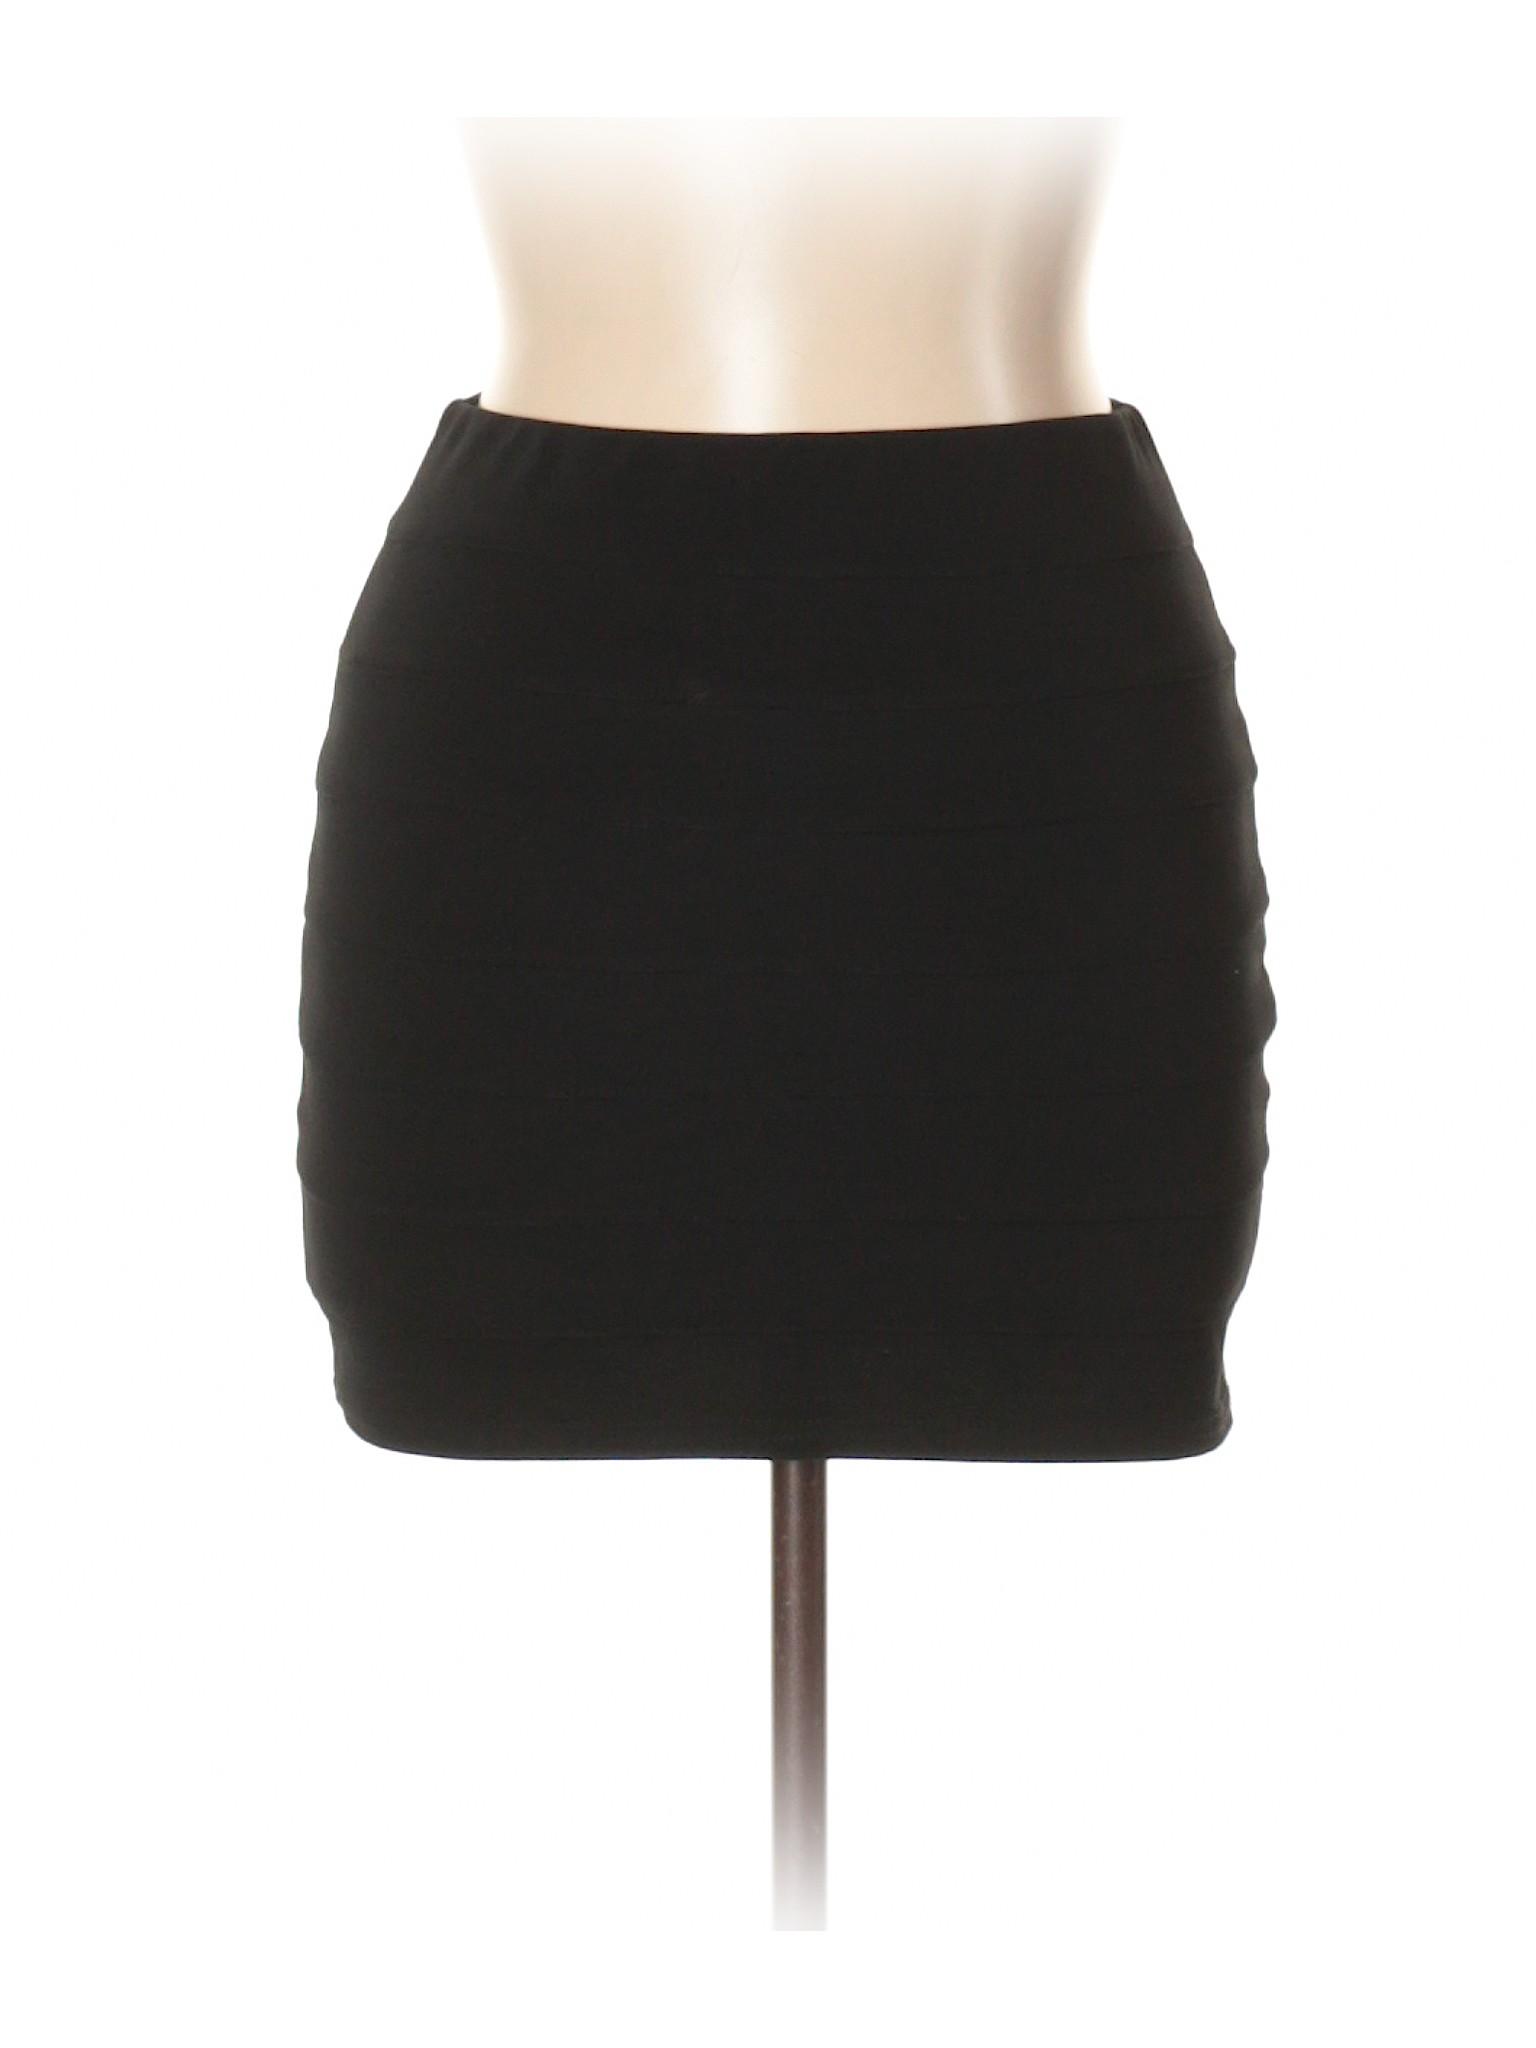 Boutique Skirt Boutique Casual Casual Casual Casual Skirt Skirt Casual Boutique Skirt Casual Boutique Boutique Boutique Skirt Skirt wraqcUAw